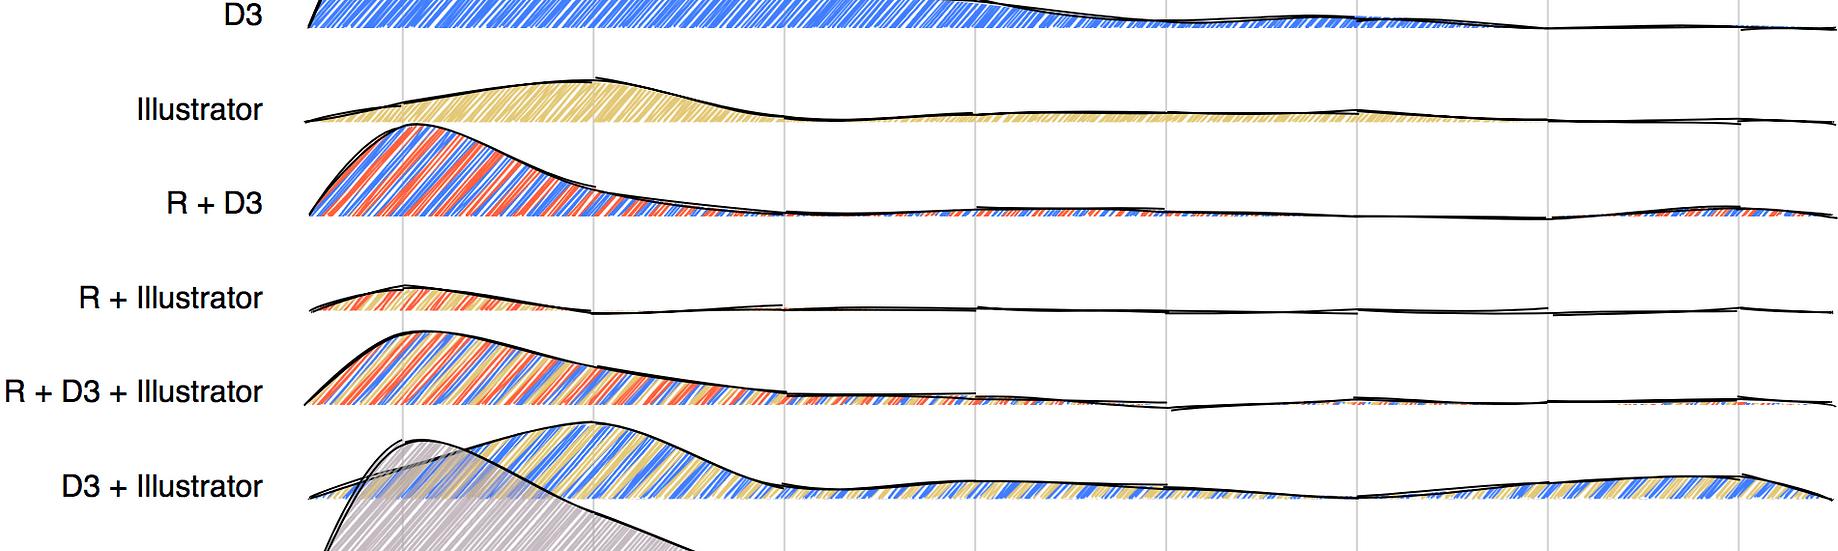 hight resolution of edward tufte diagram